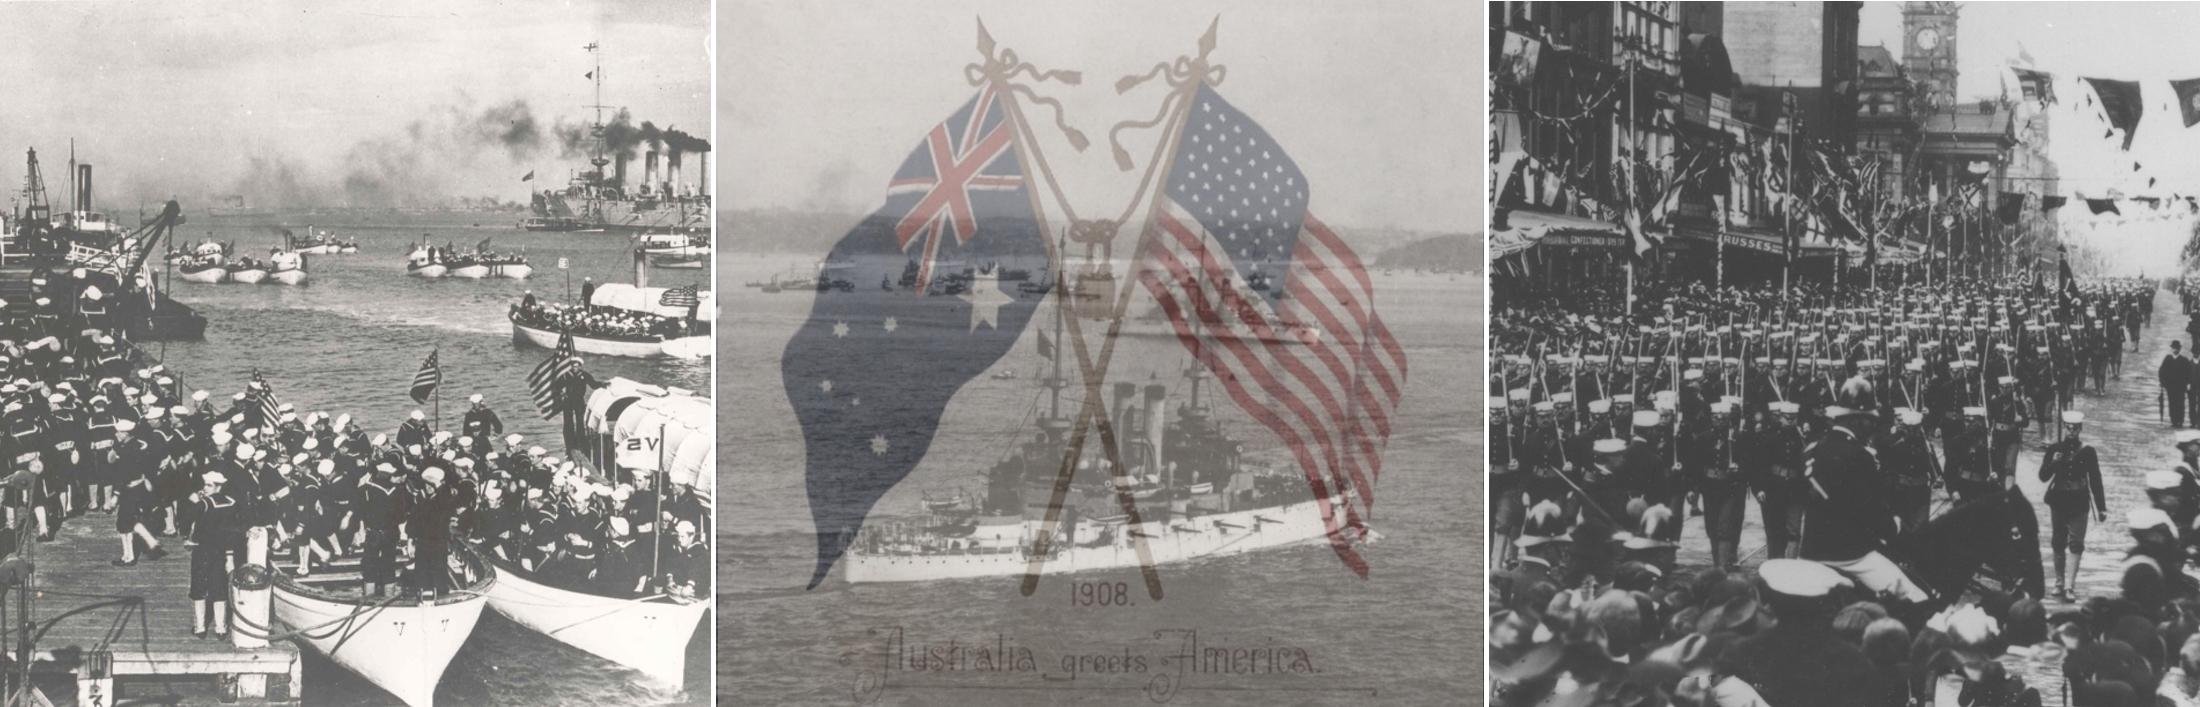 The Great White Fleets 1908 Visit To Australia Royal Australian Navy